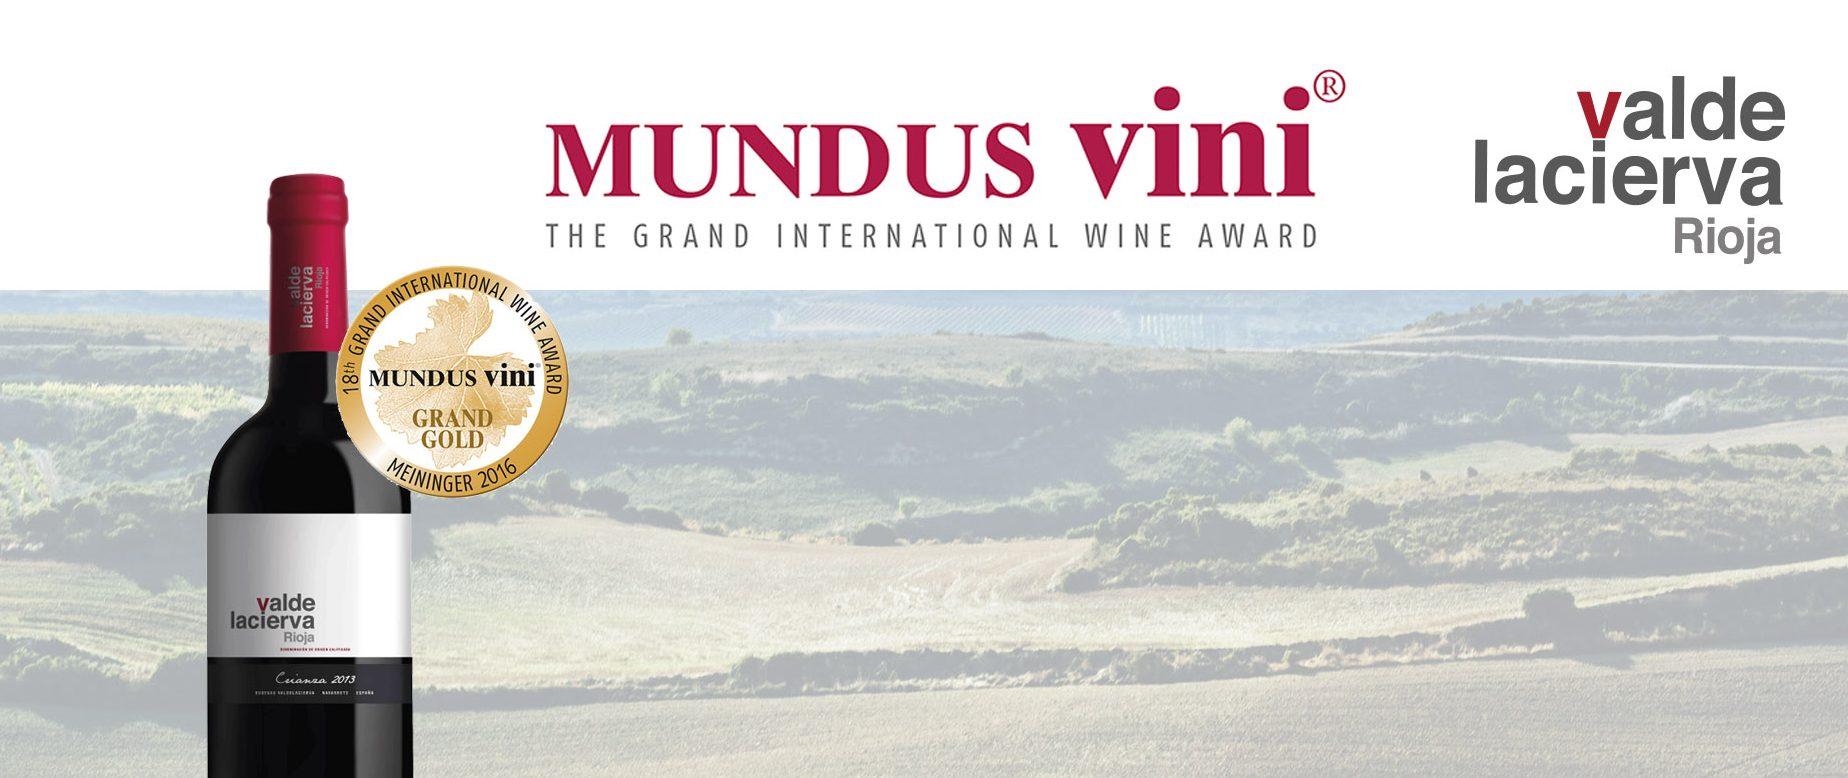 Mundus Vini gives its biggest award to Valdelacierva Crianza 2013.